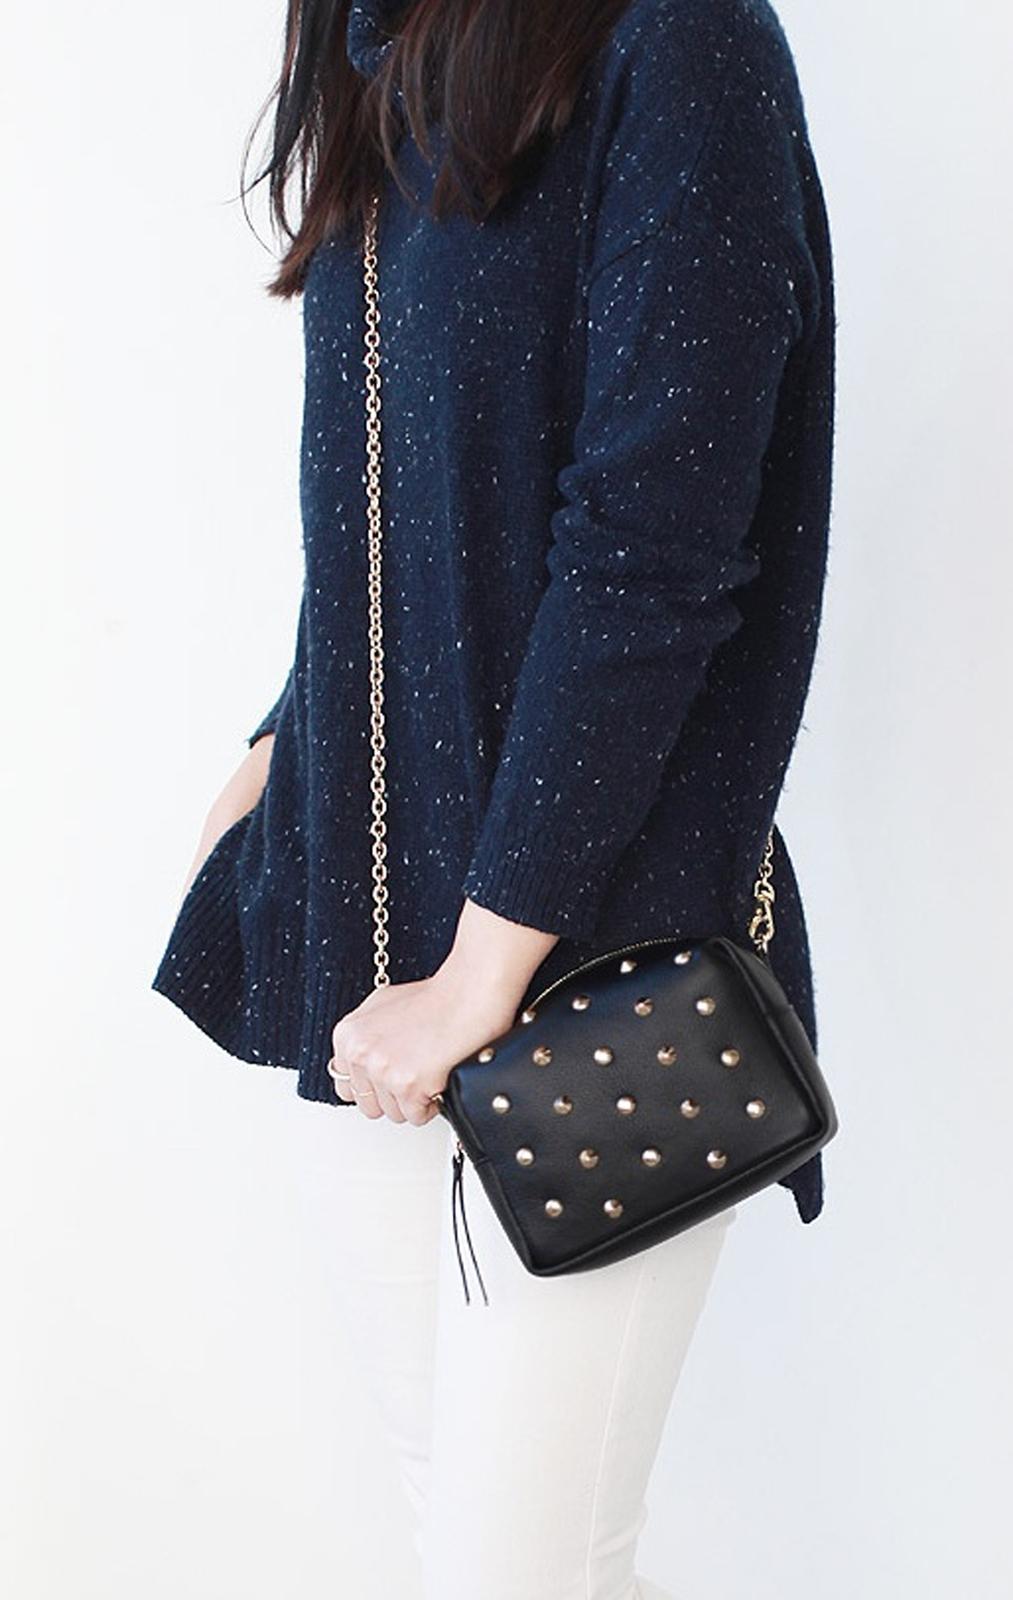 Chic Studded Black Little Purse. Black Genuine Leather Handbag.Studs Clutch Bag